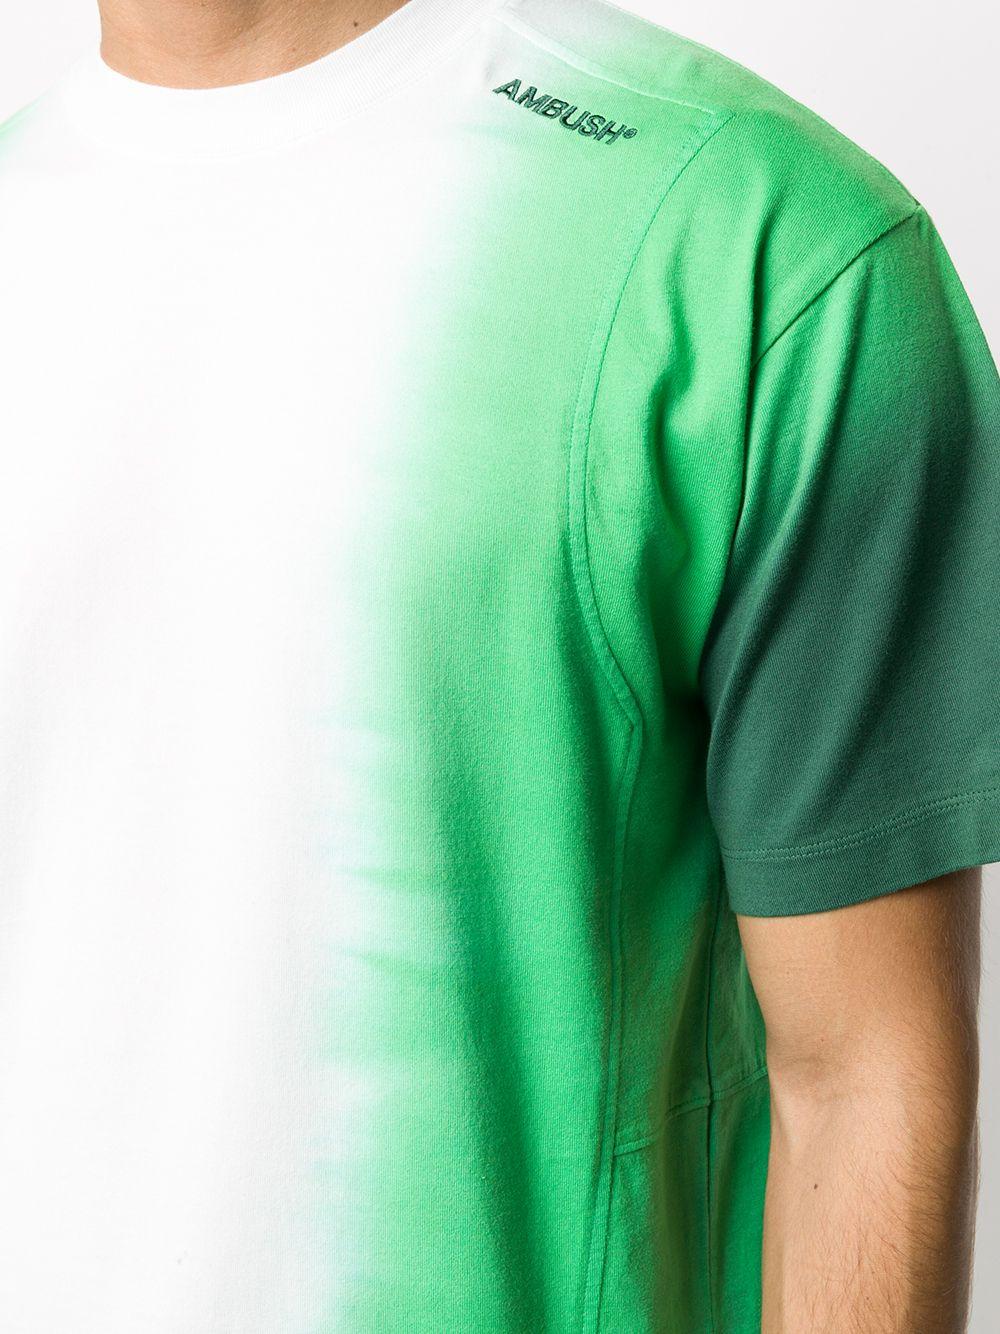 Picture of Ambush | Tie-Dye Crewneck T-Shirt